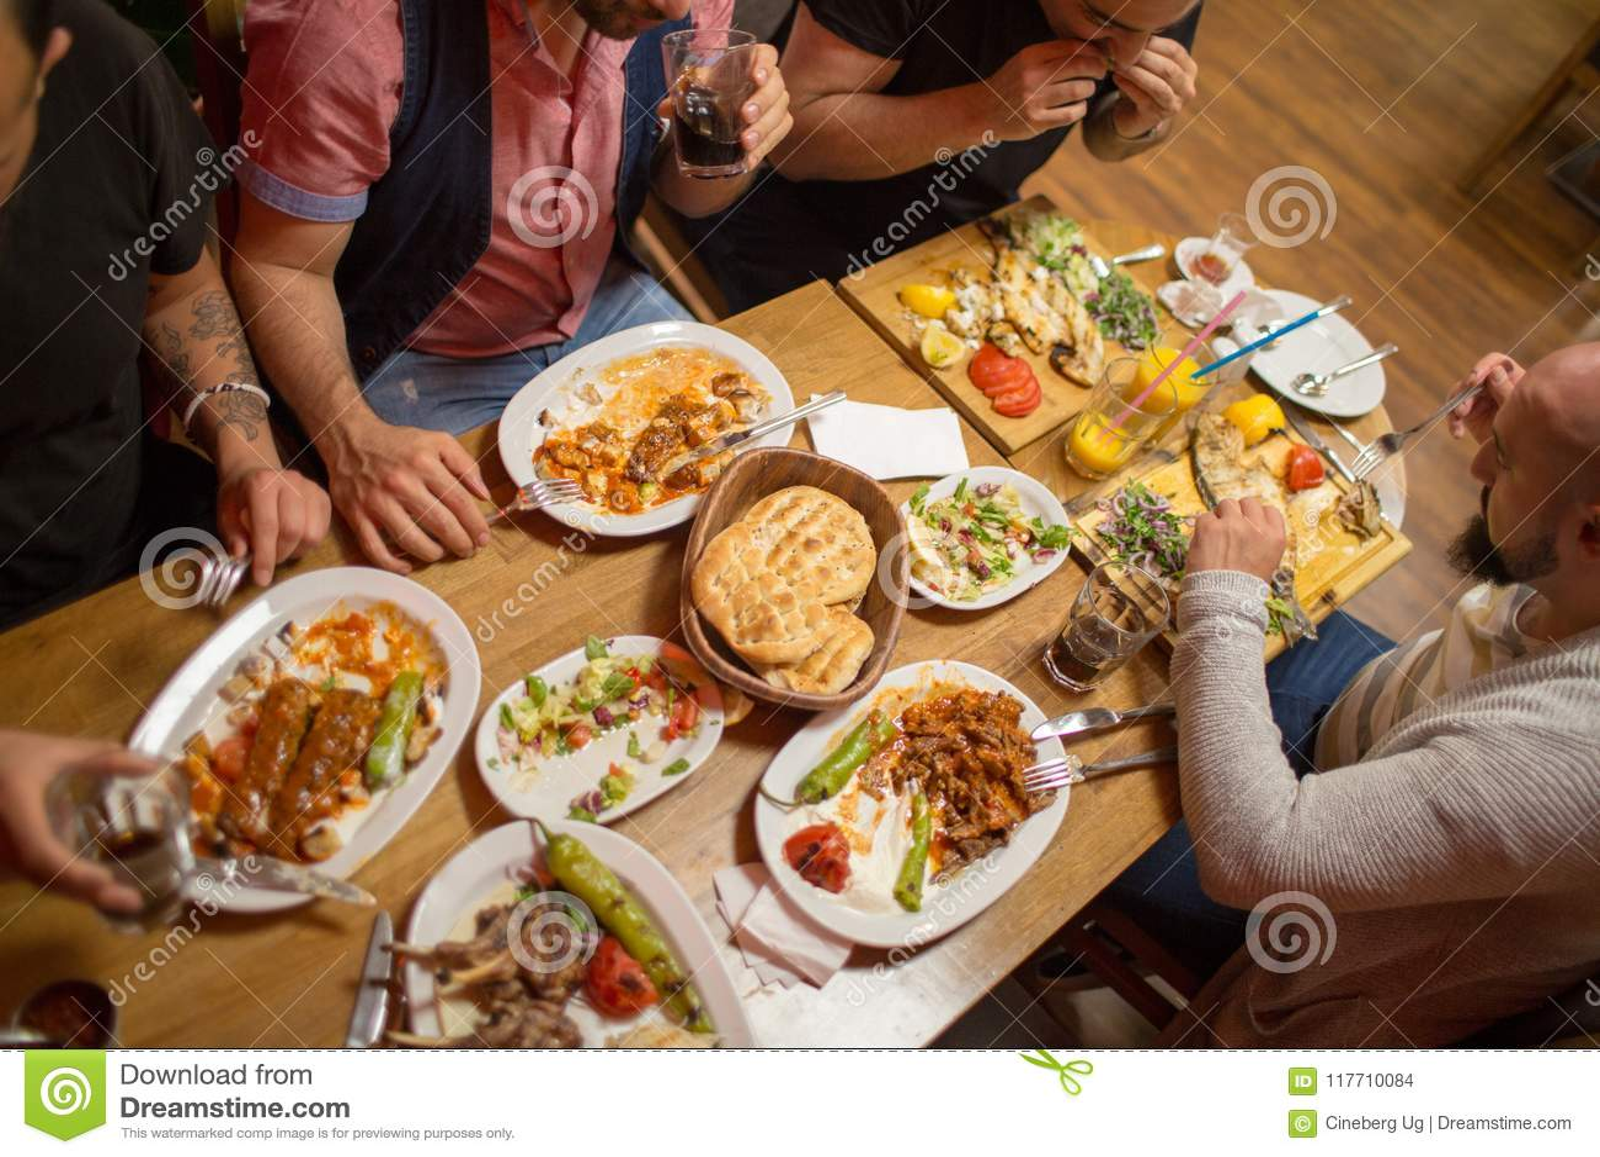 Arab Men In Restaurant Enjoying Middle Eastern Food Stock